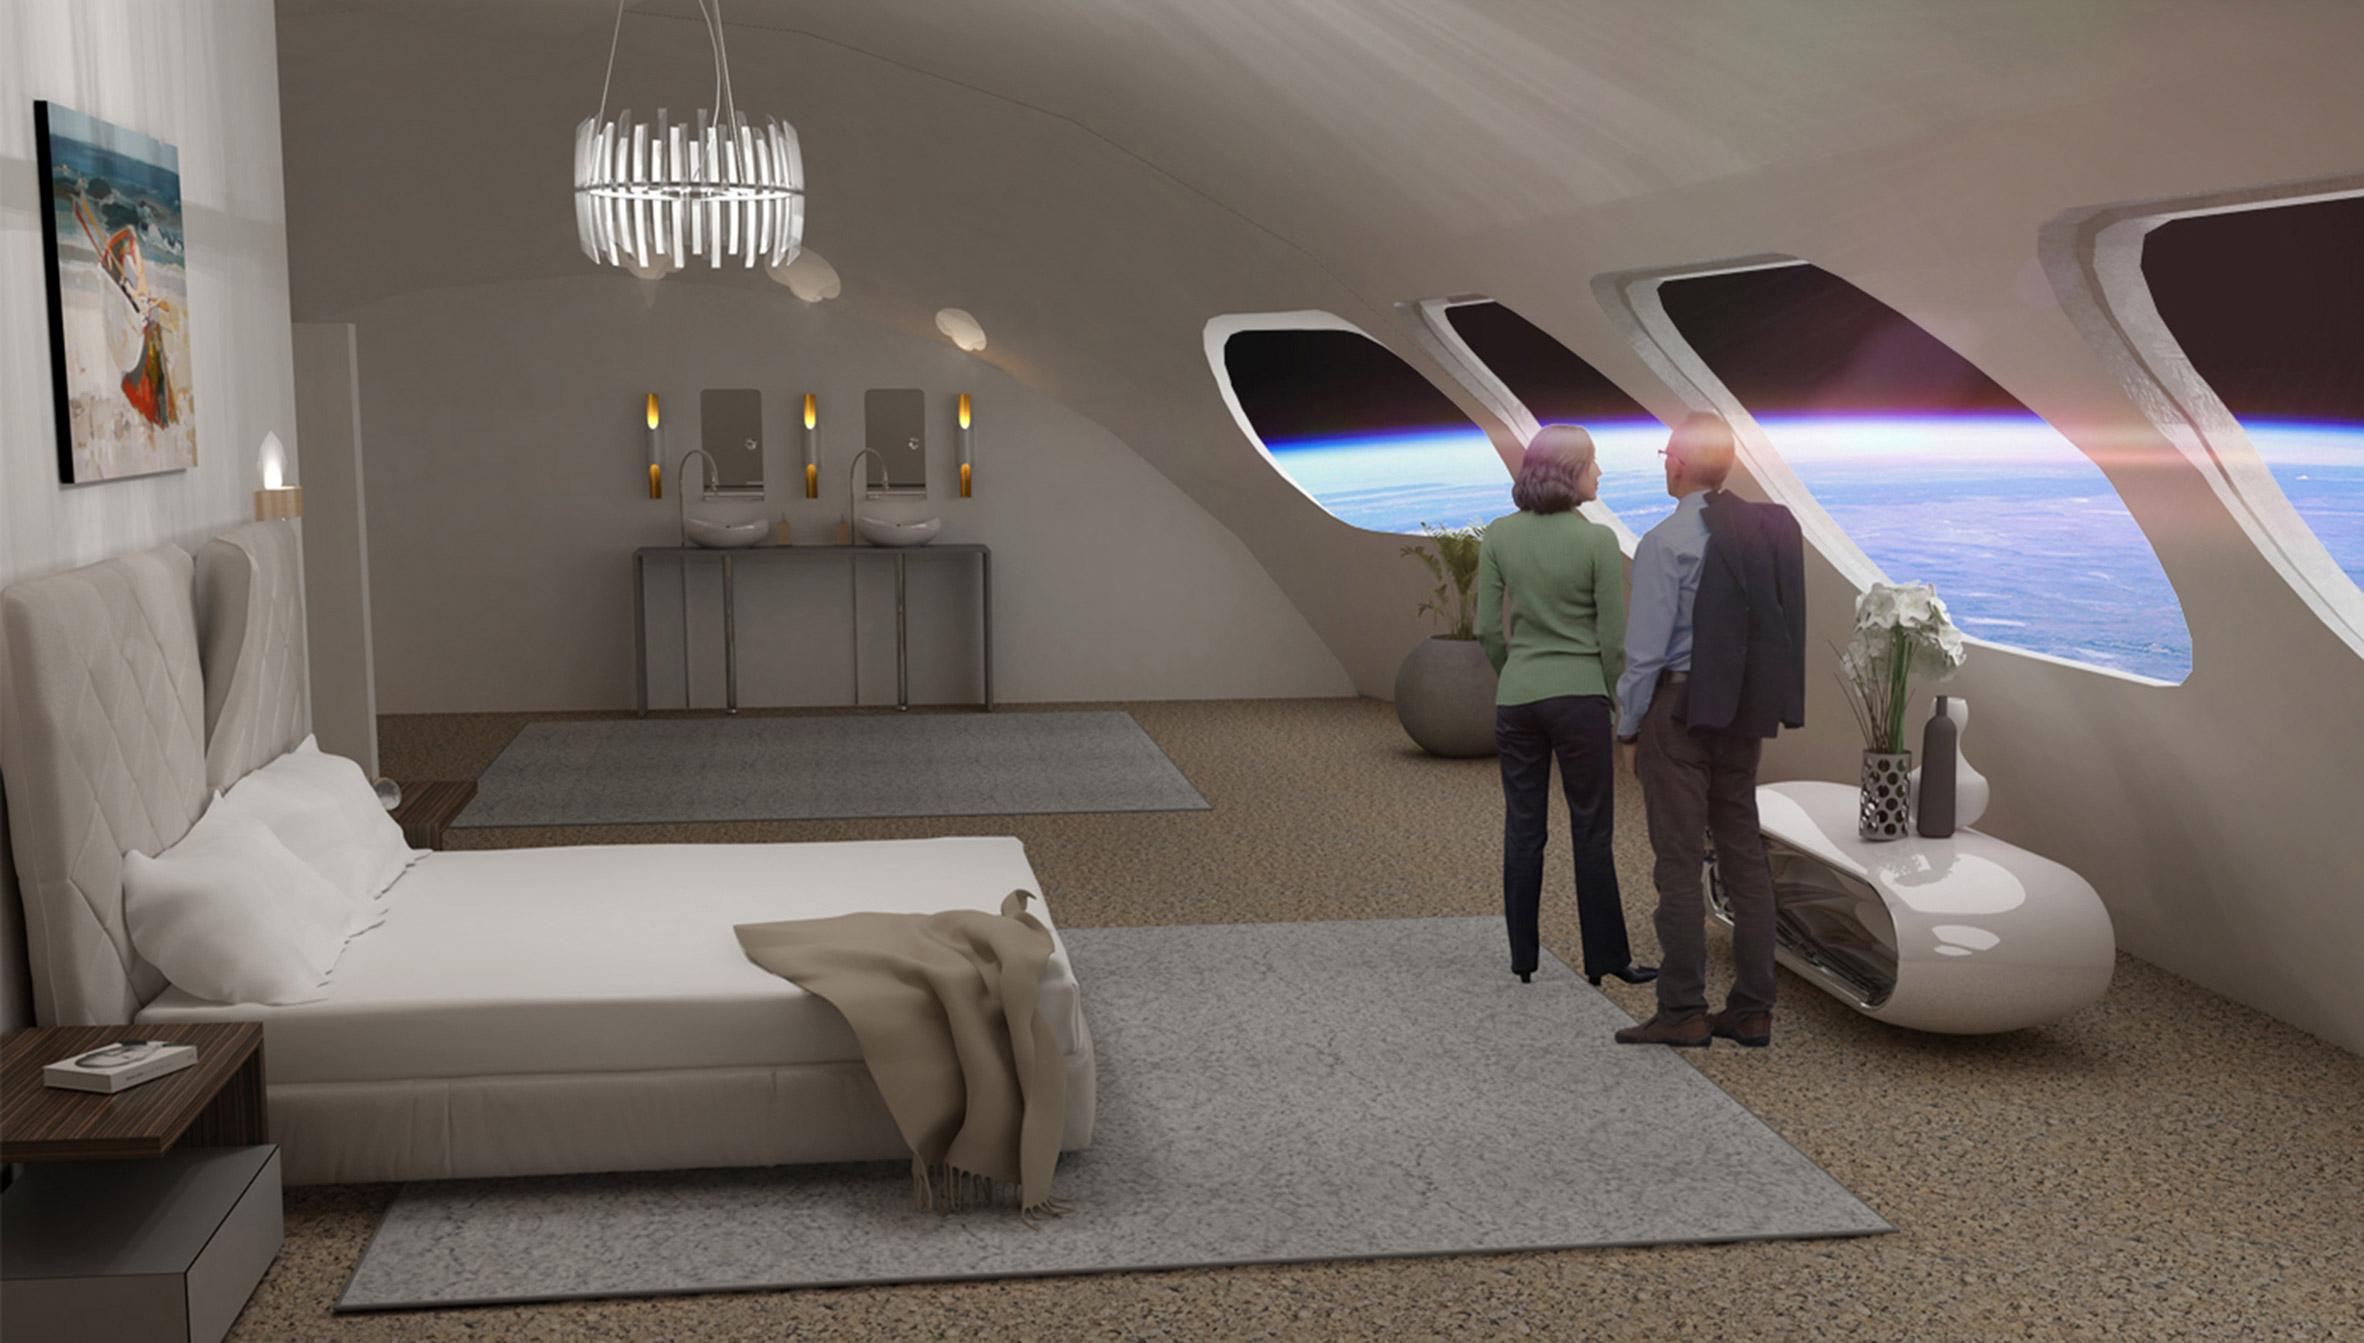 Voyager Station Space Hotel bedroom